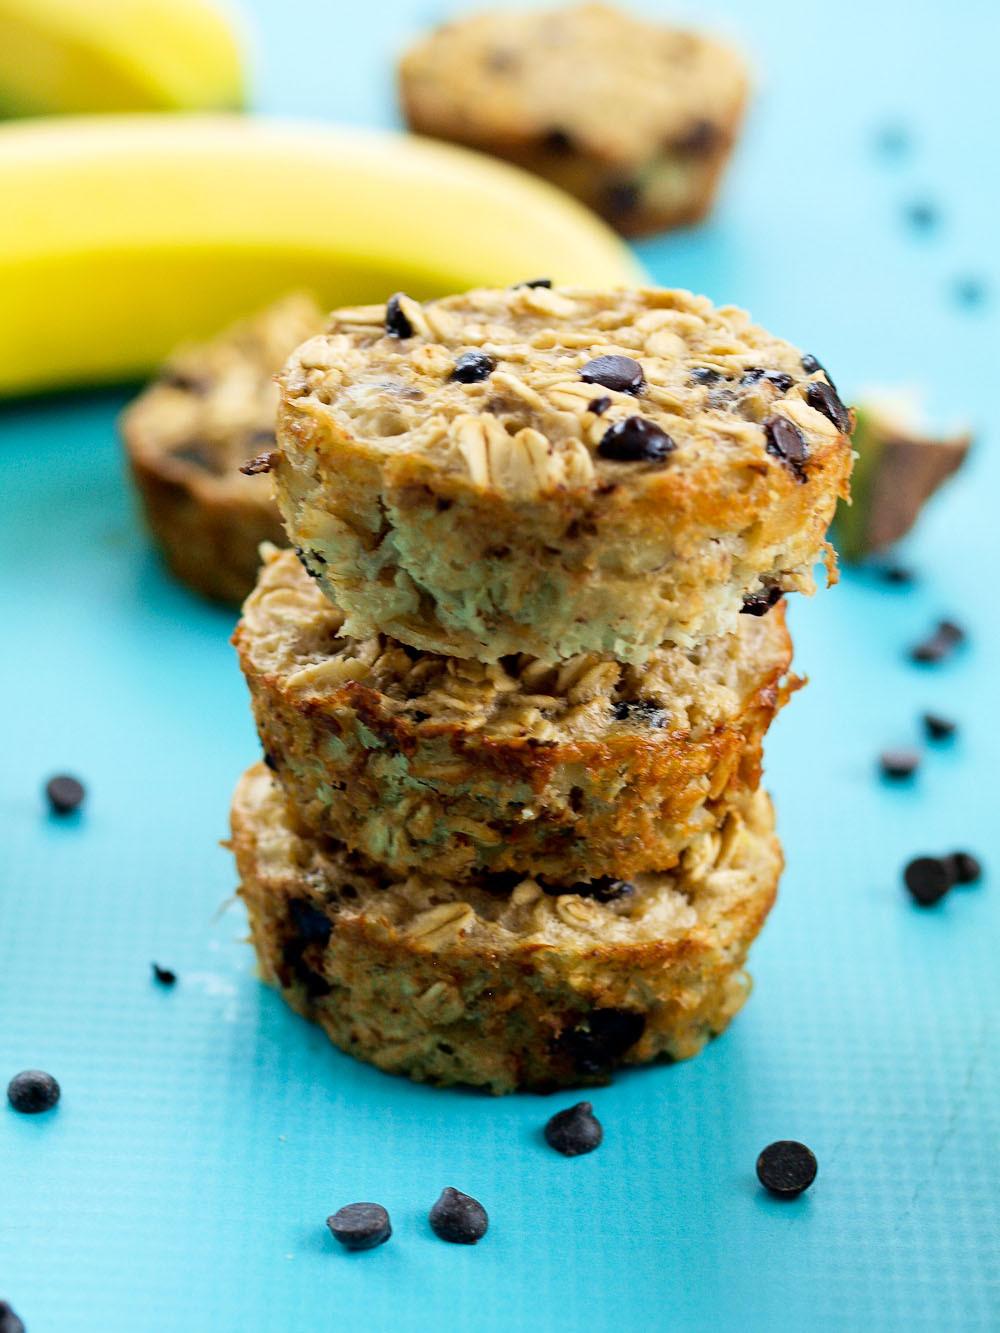 Healthy Banana Oatmeal Chocolate Chip Muffins  Banana Chocolate Chip Baked Oatmeal Muffins Happy